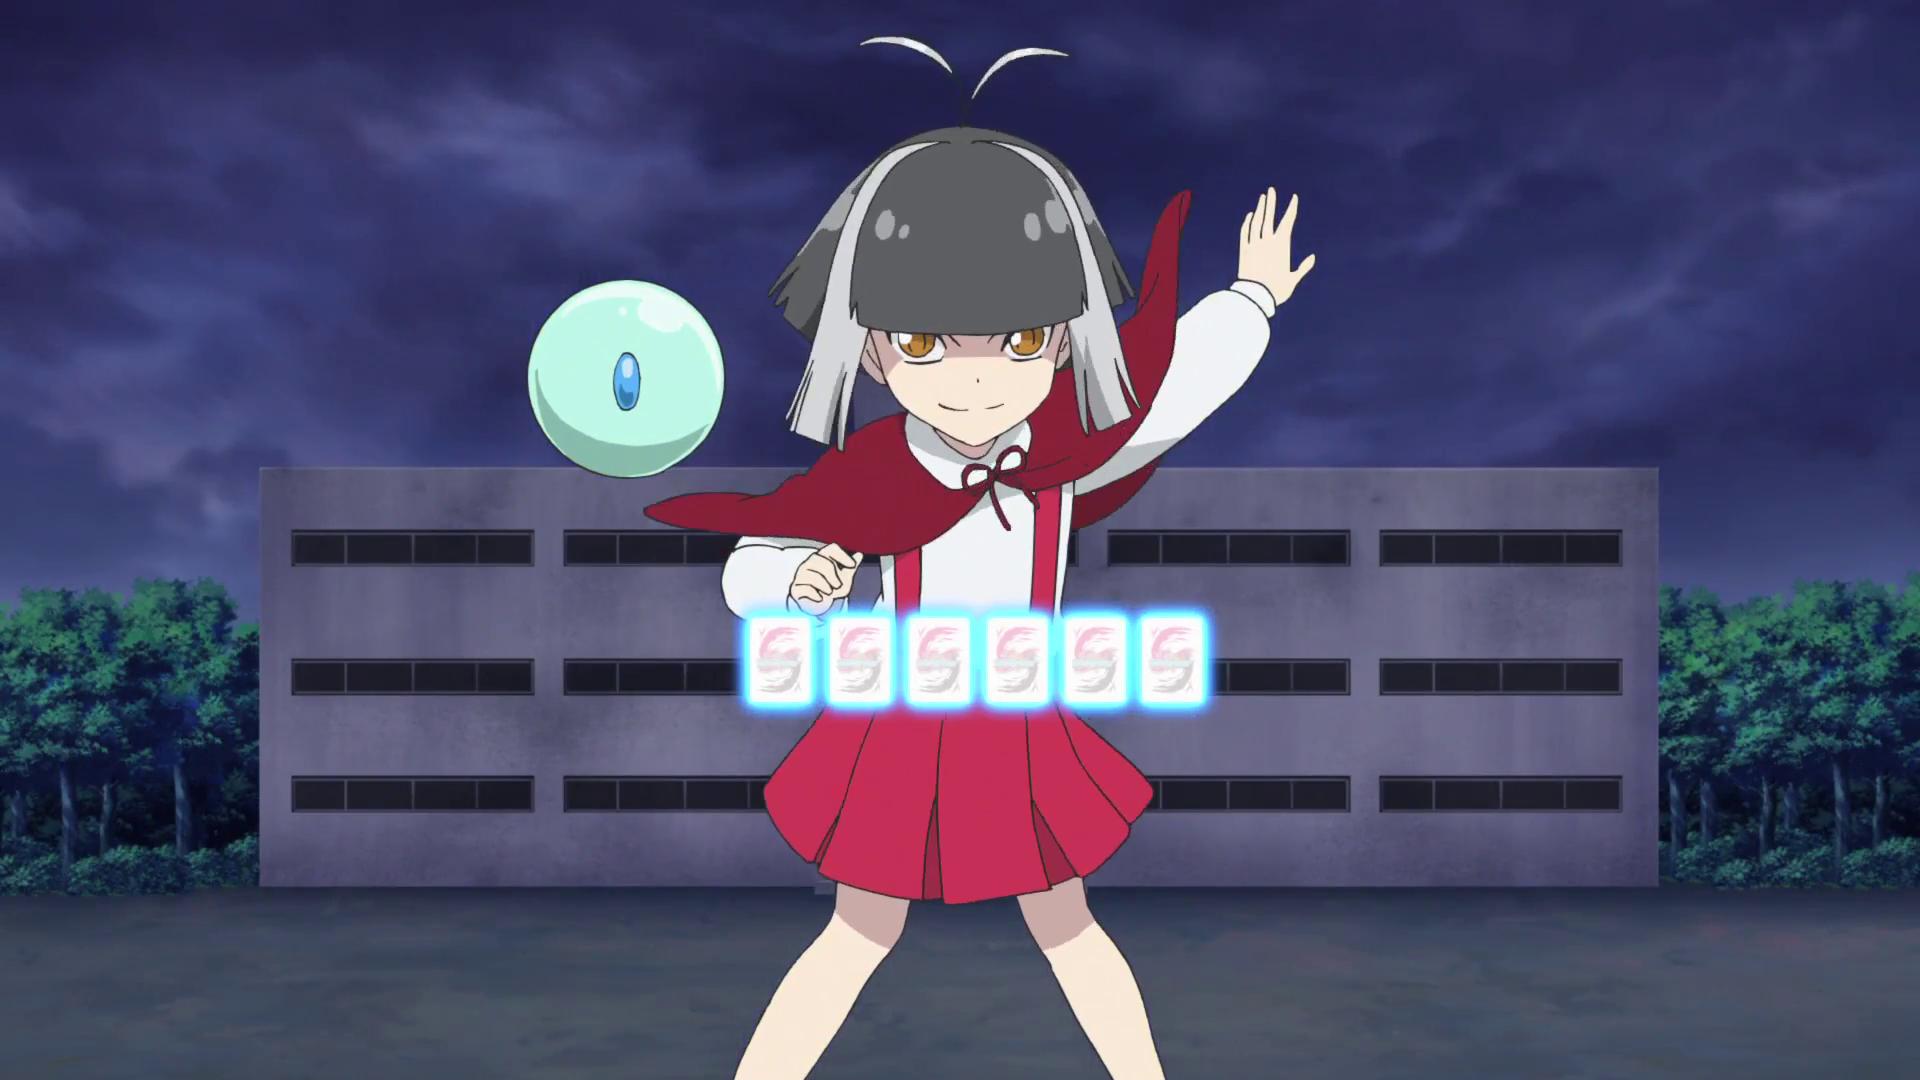 The Hanako In The Toilet (character)